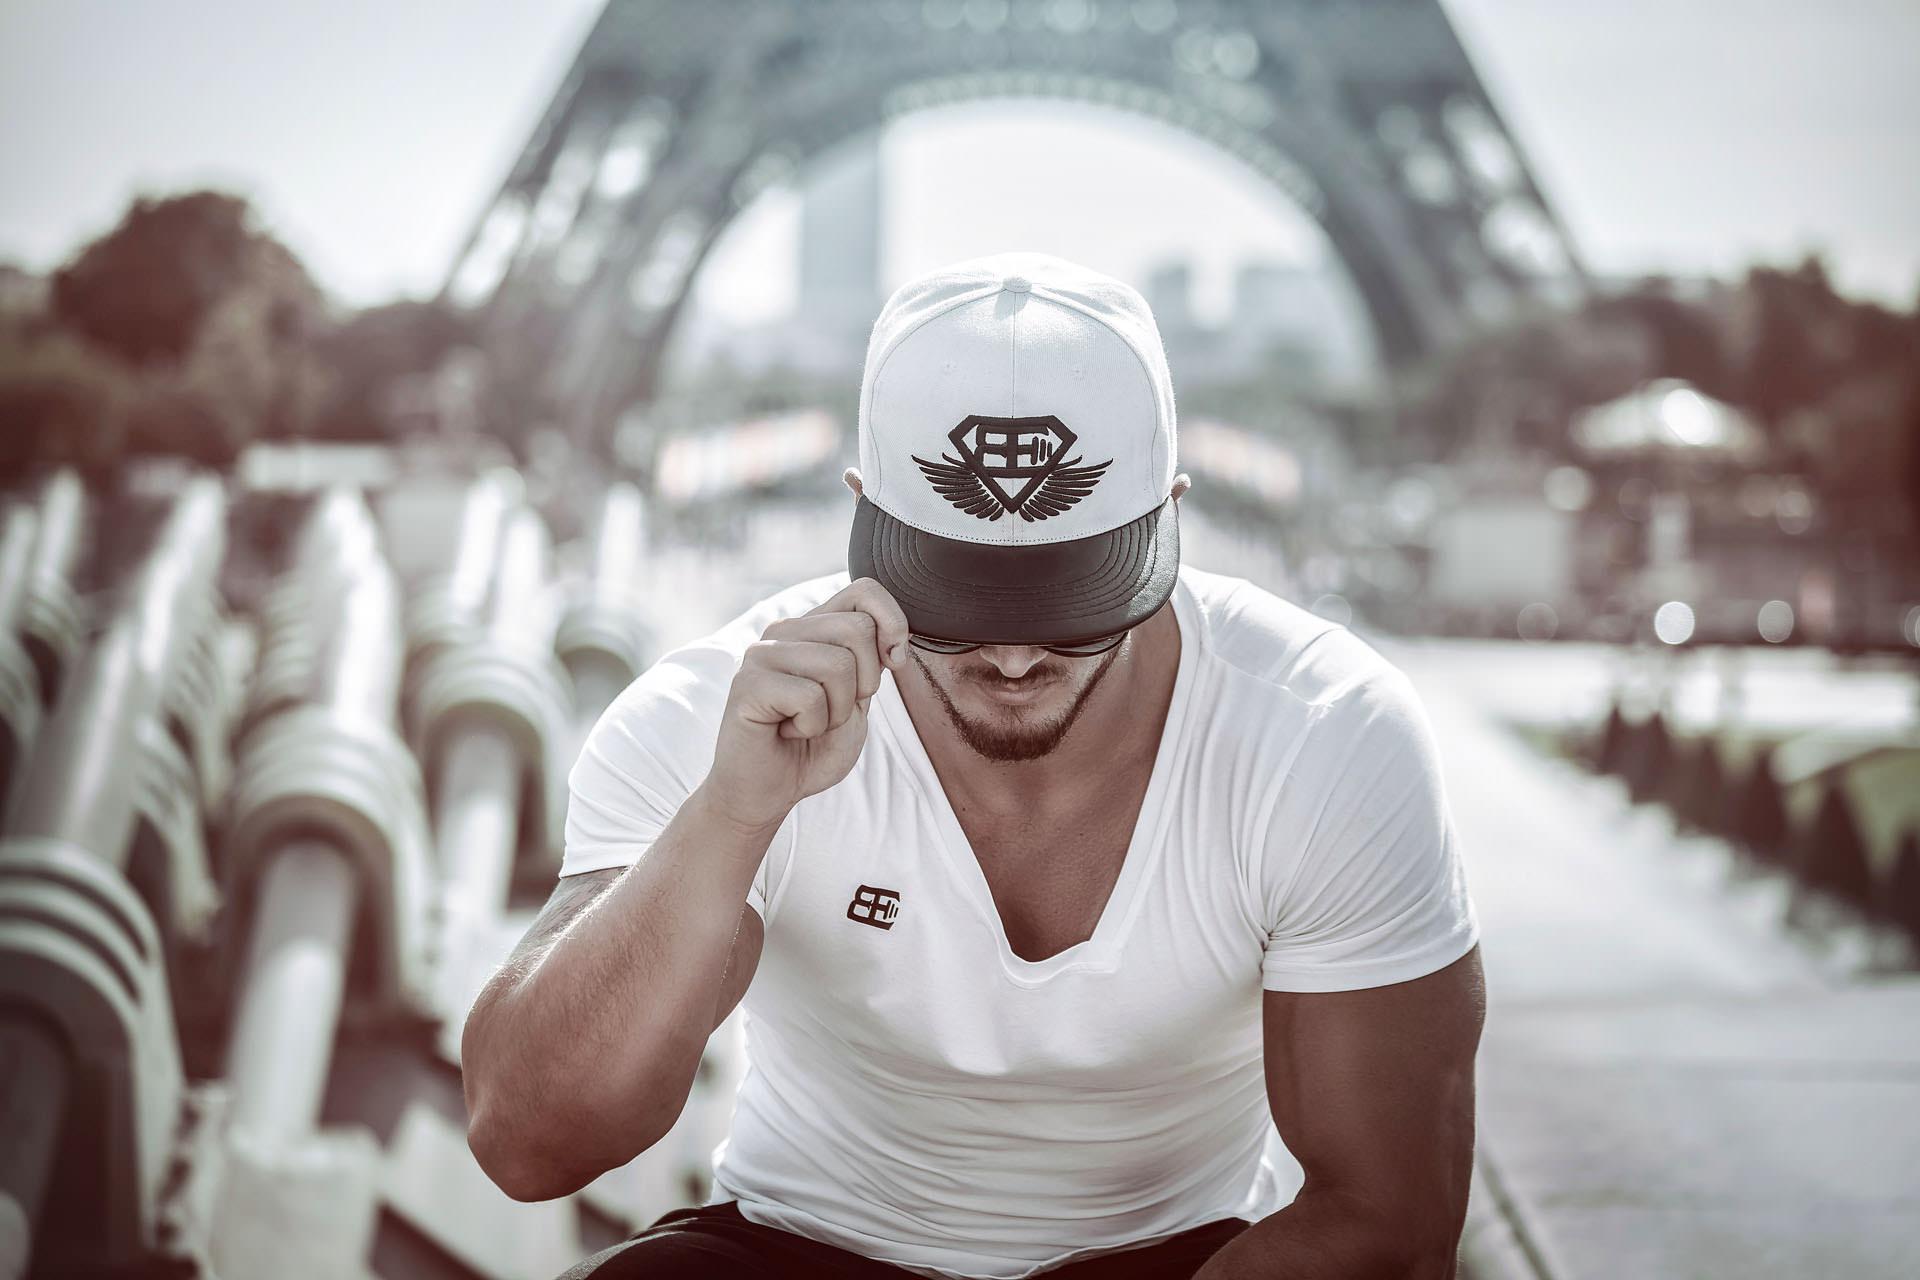 2015-09-11 - Anthony Amar - BE - Paris & ParadiForm - 8387 - V2 - 1920px